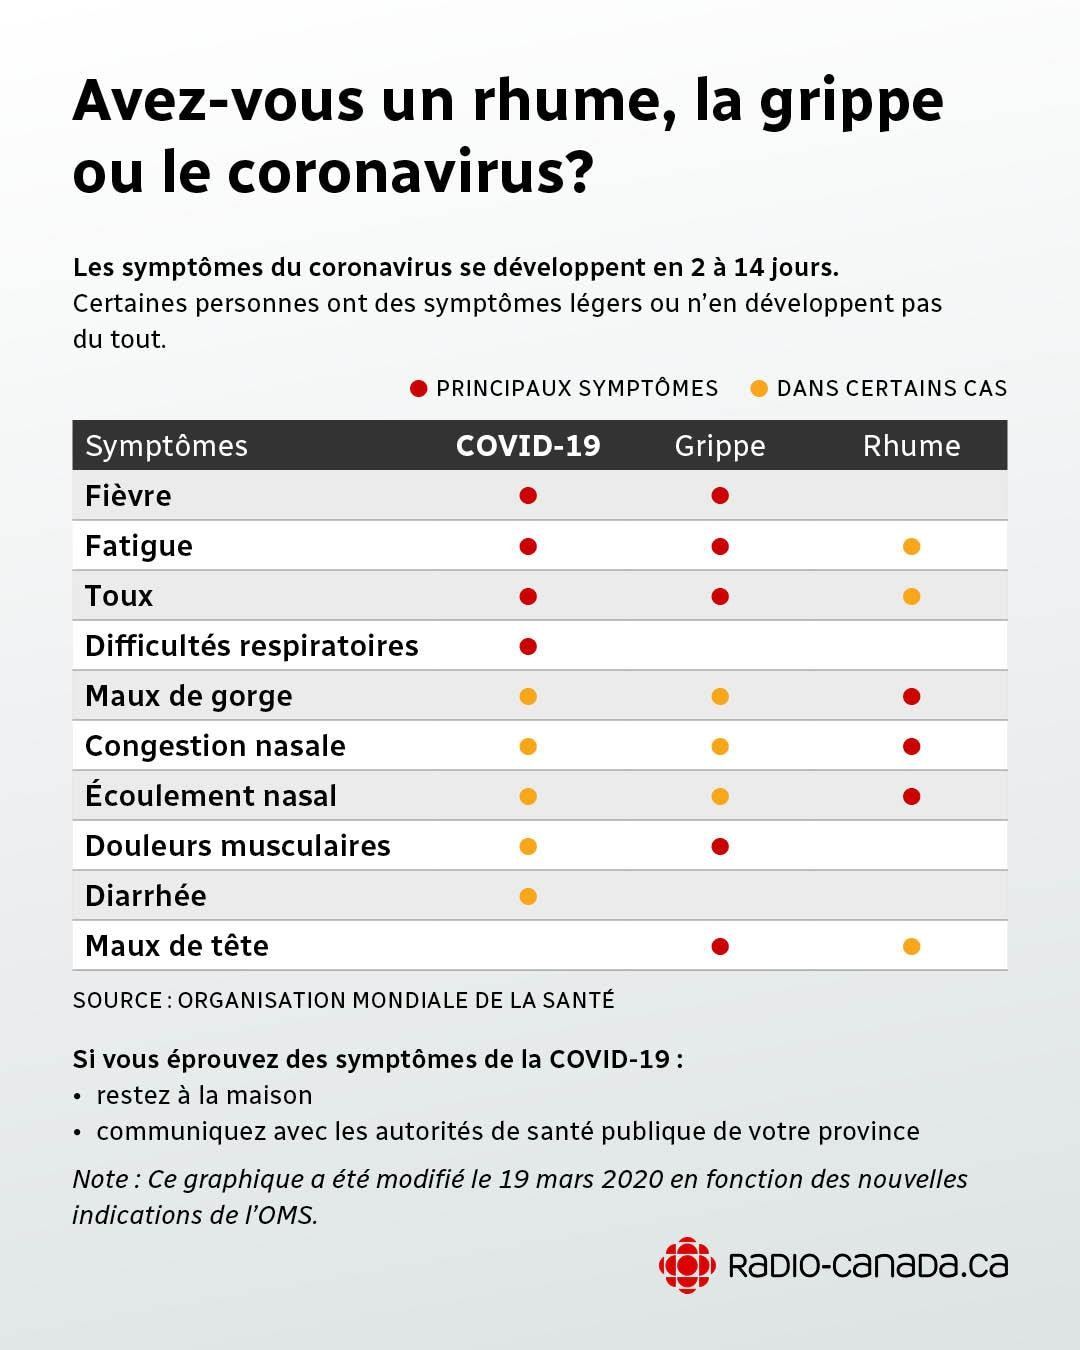 coronavirus-il-decide-qui-aura-des-symptomes-plus-graves.jpg.jpg